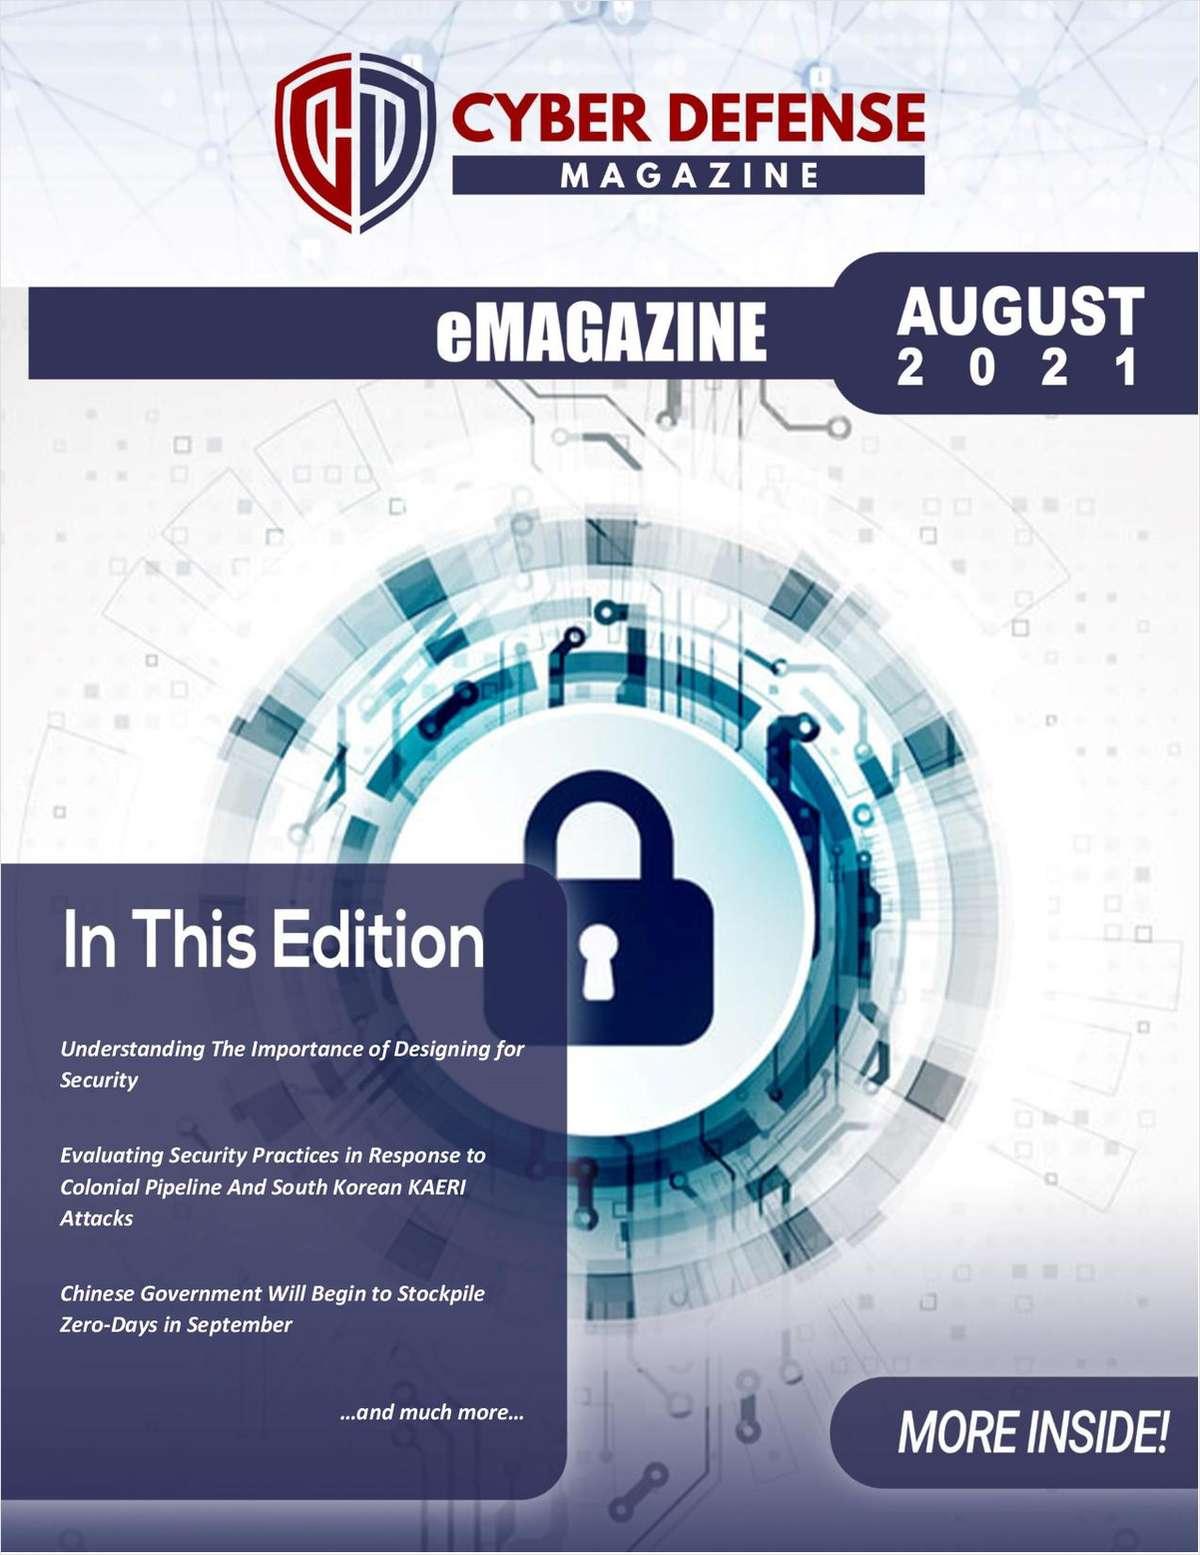 Cyber Defense Magazine August 2021 Edition